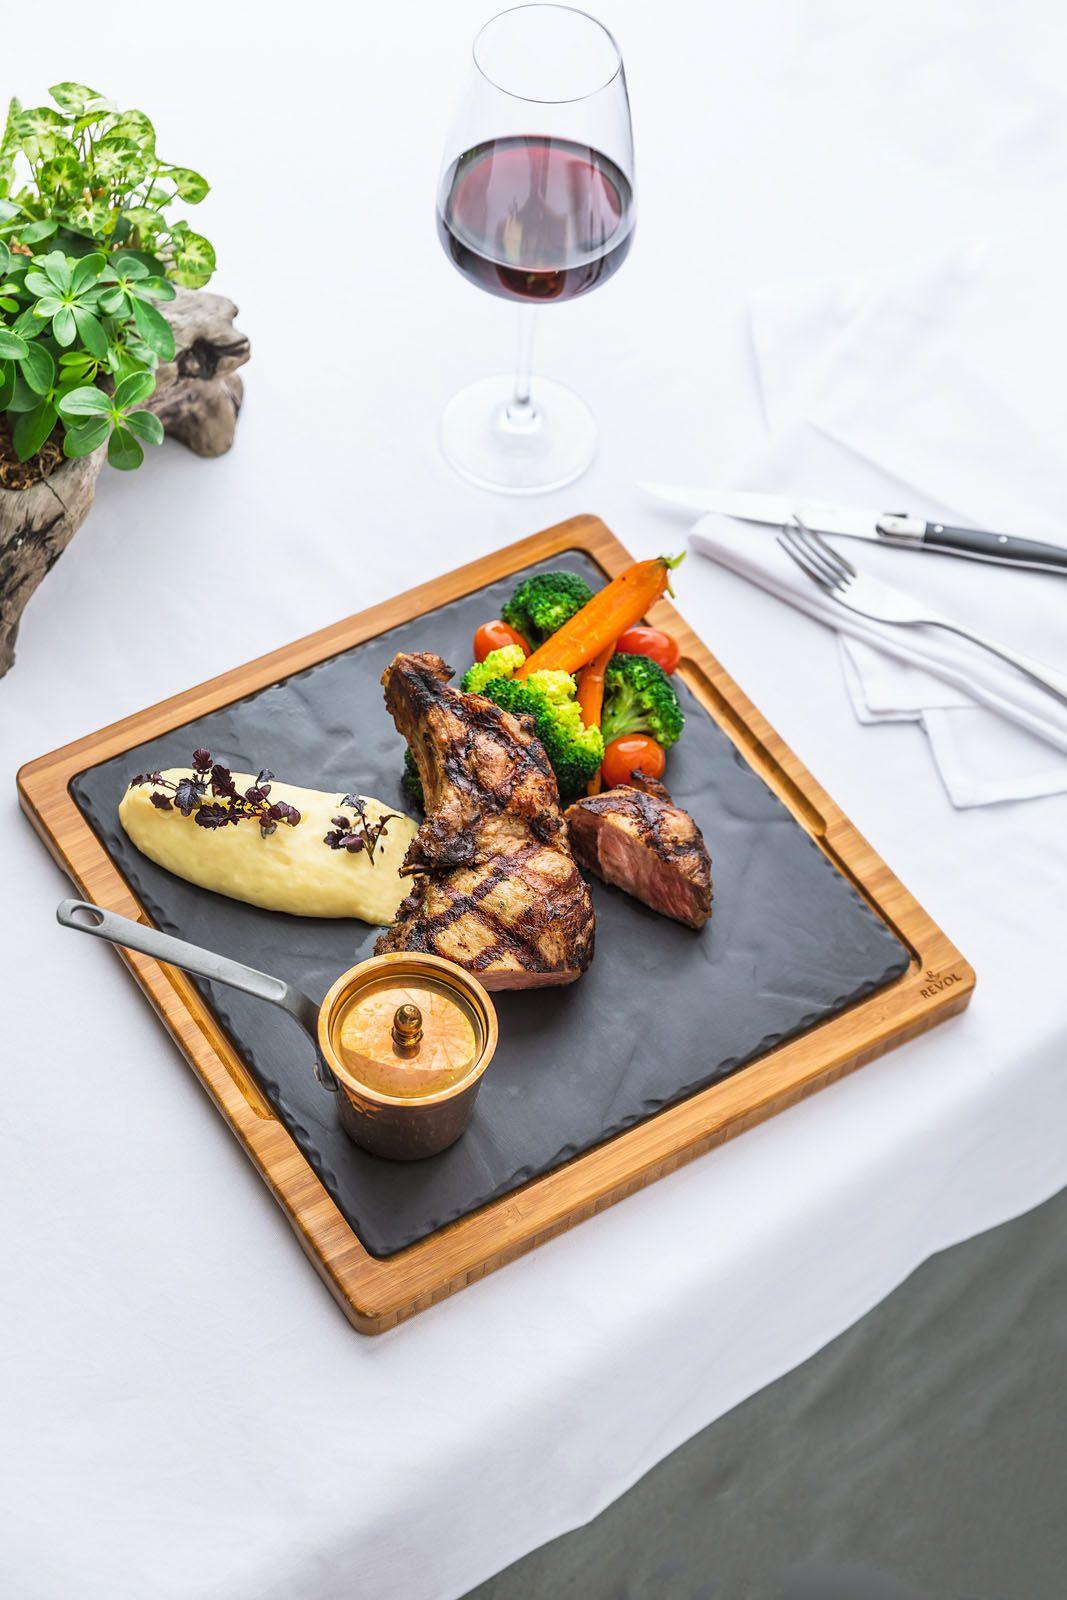 Where to Eat in Singapore This Week: Jade Restaurant, Don Ho Social Kitchen & Bar, Bedrock Bar & Grill, Li Bai Cantonese Restaurant, Tablescape Restaurant & Bar